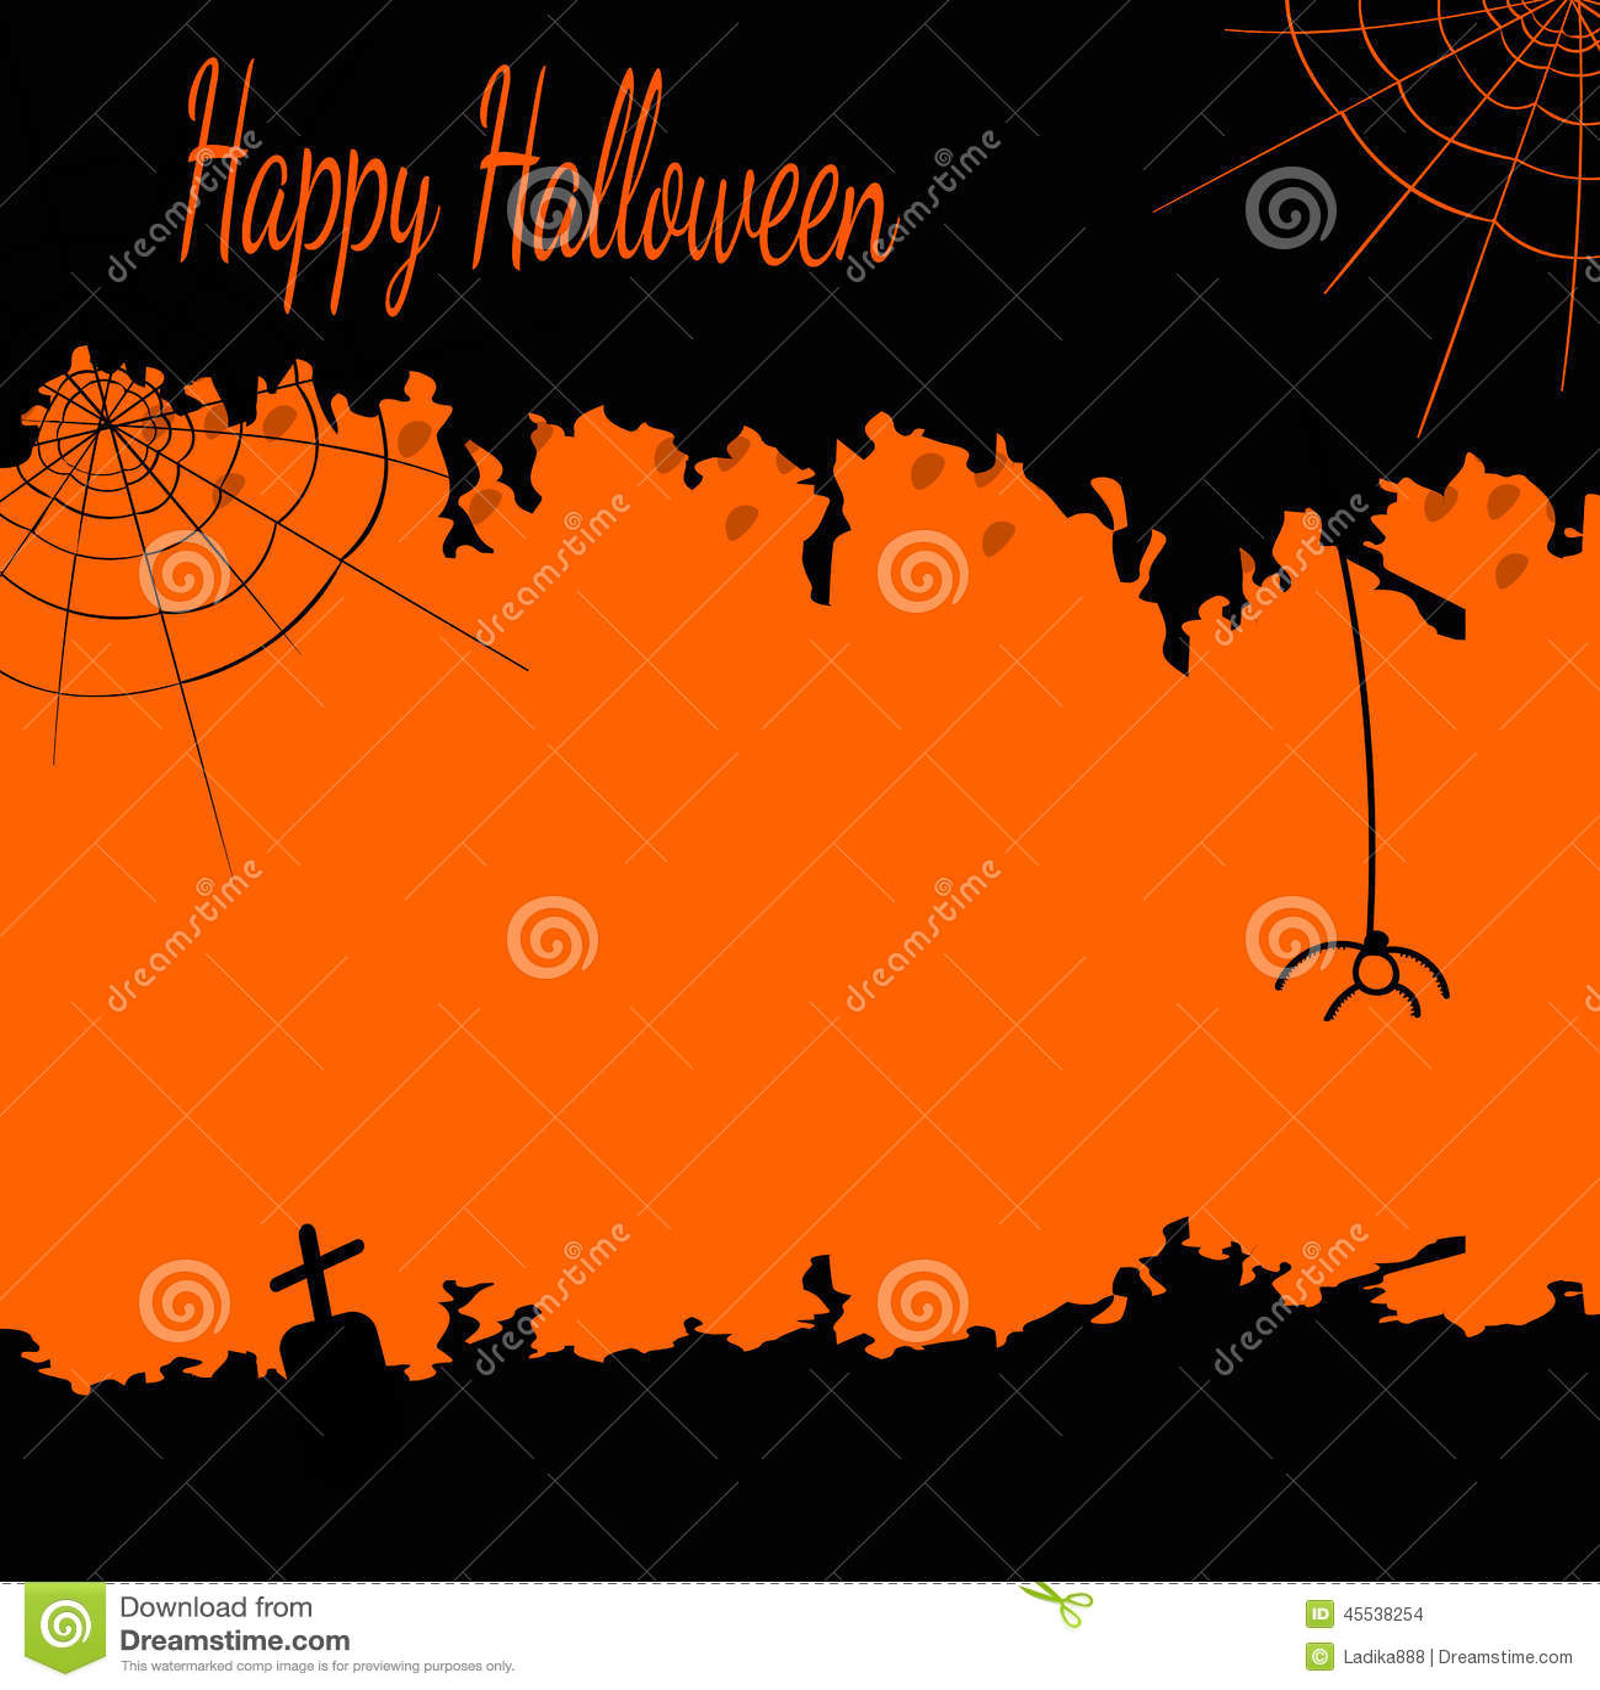 black design festive halloween orange - Black And Orange Halloween